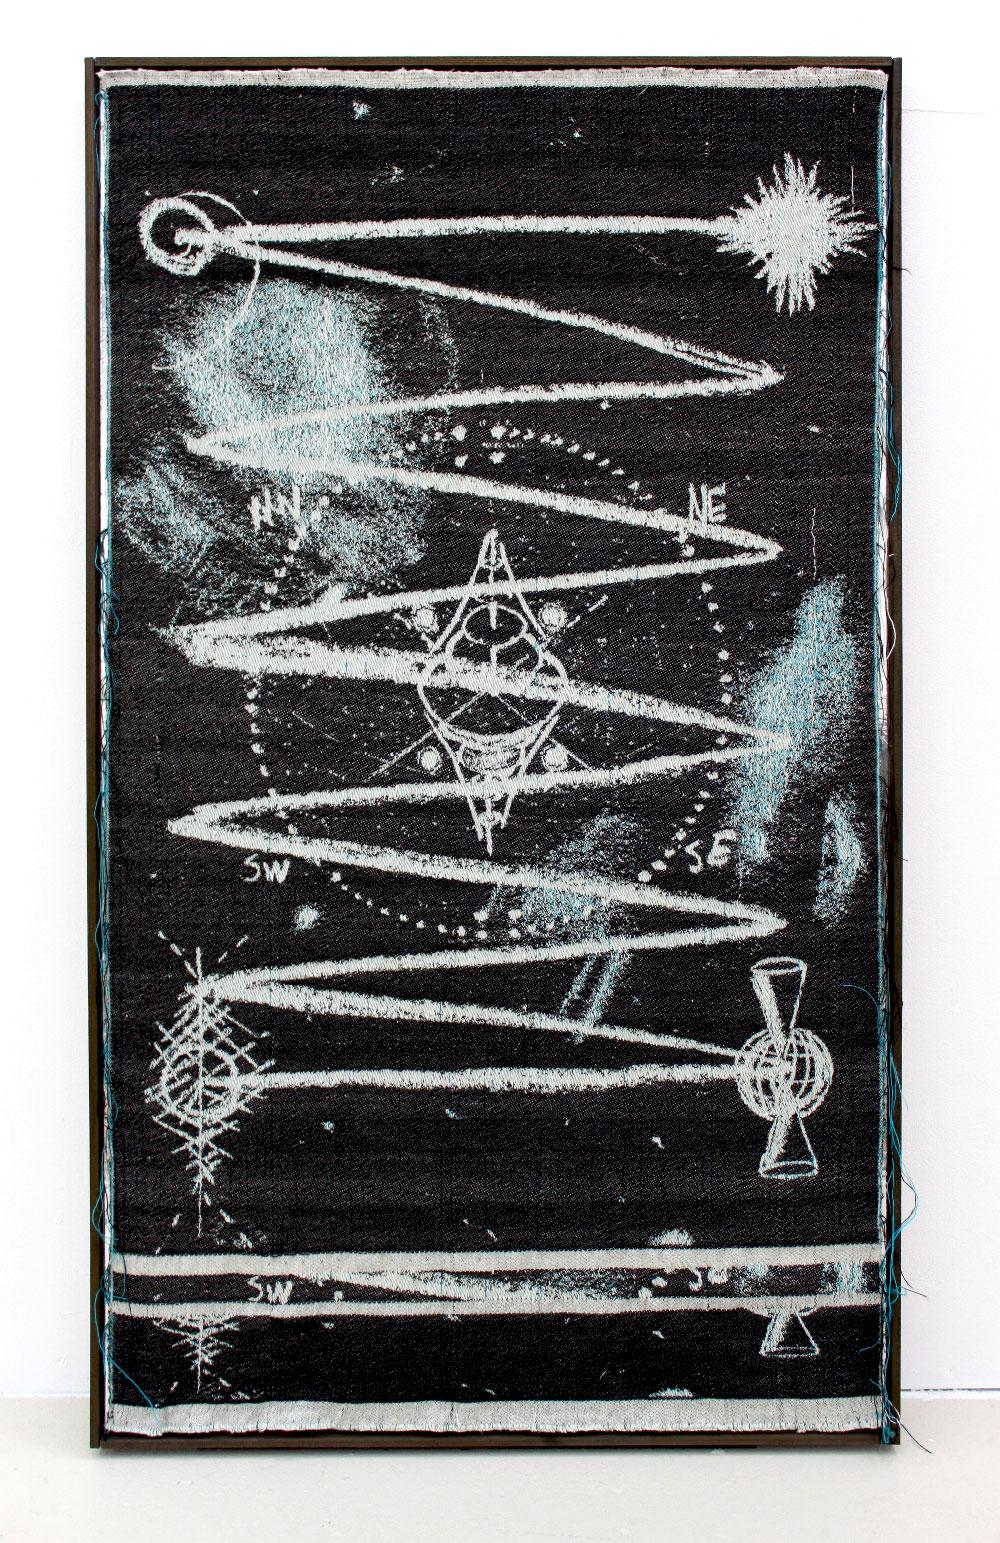 Weaving the Cosmos - 1320x2816 pixel, wool, 2011